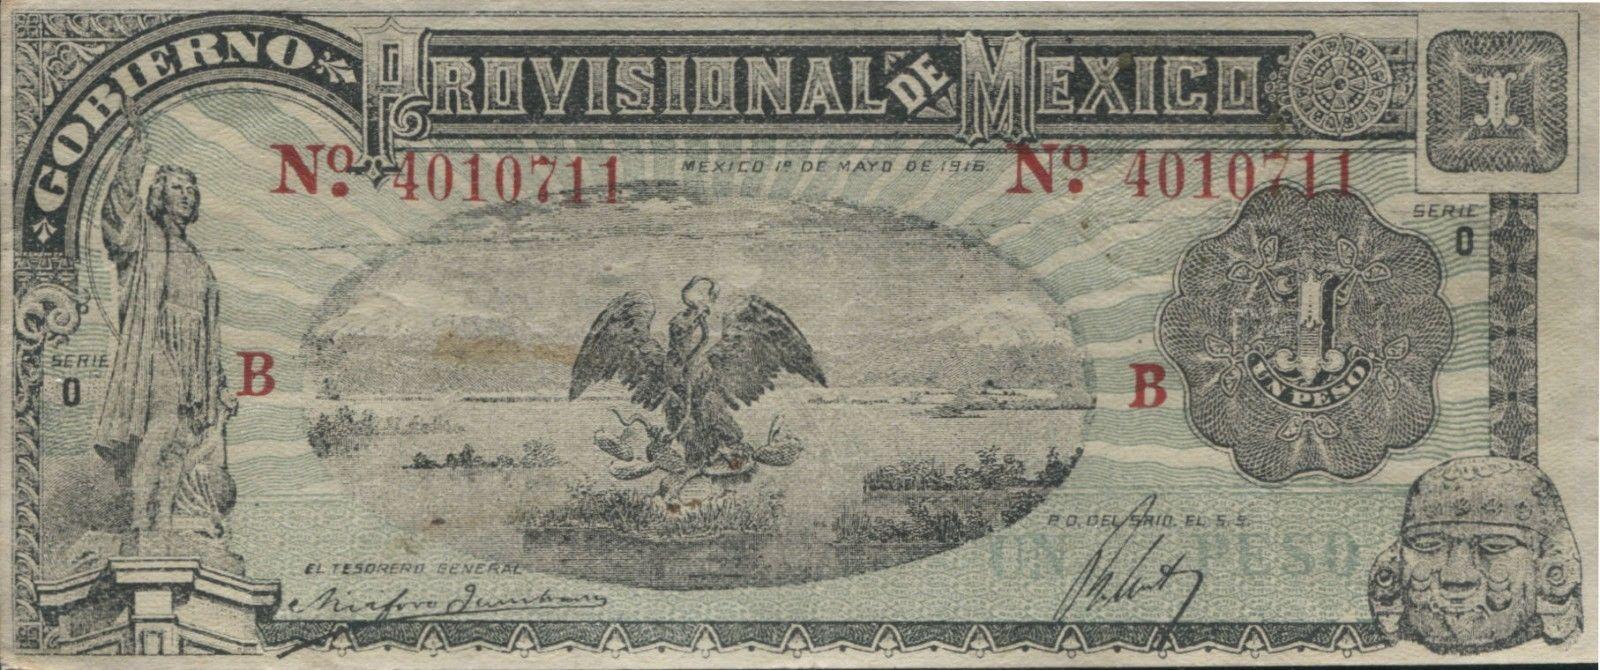 Mexico P-S709 Gobierno Provisional De Mexico 1 Peso  XF